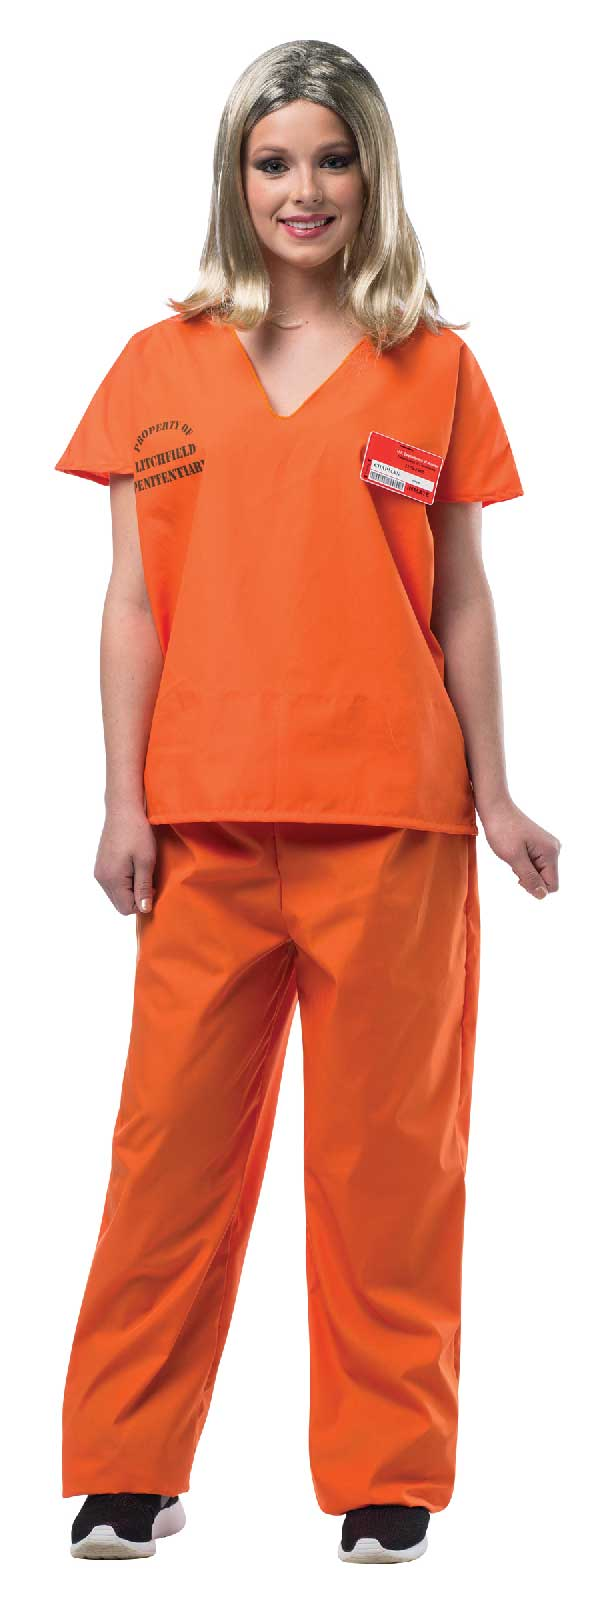 Orange And Black Jumpsuit